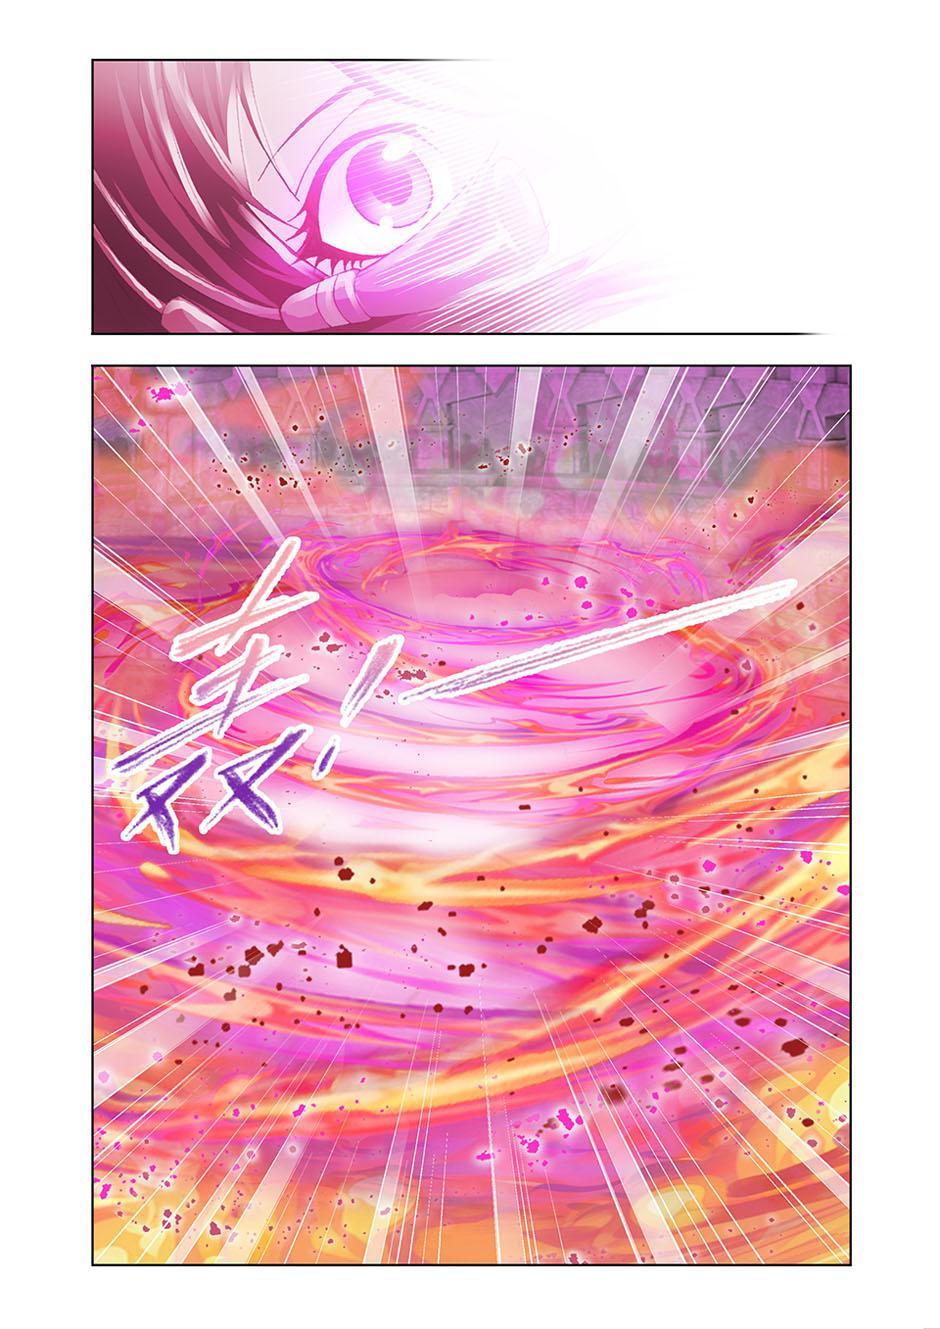 http://c5.ninemanga.com/es_manga/18/16210/417583/a063cc938acb44d58b2612c6f3e5504f.jpg Page 7